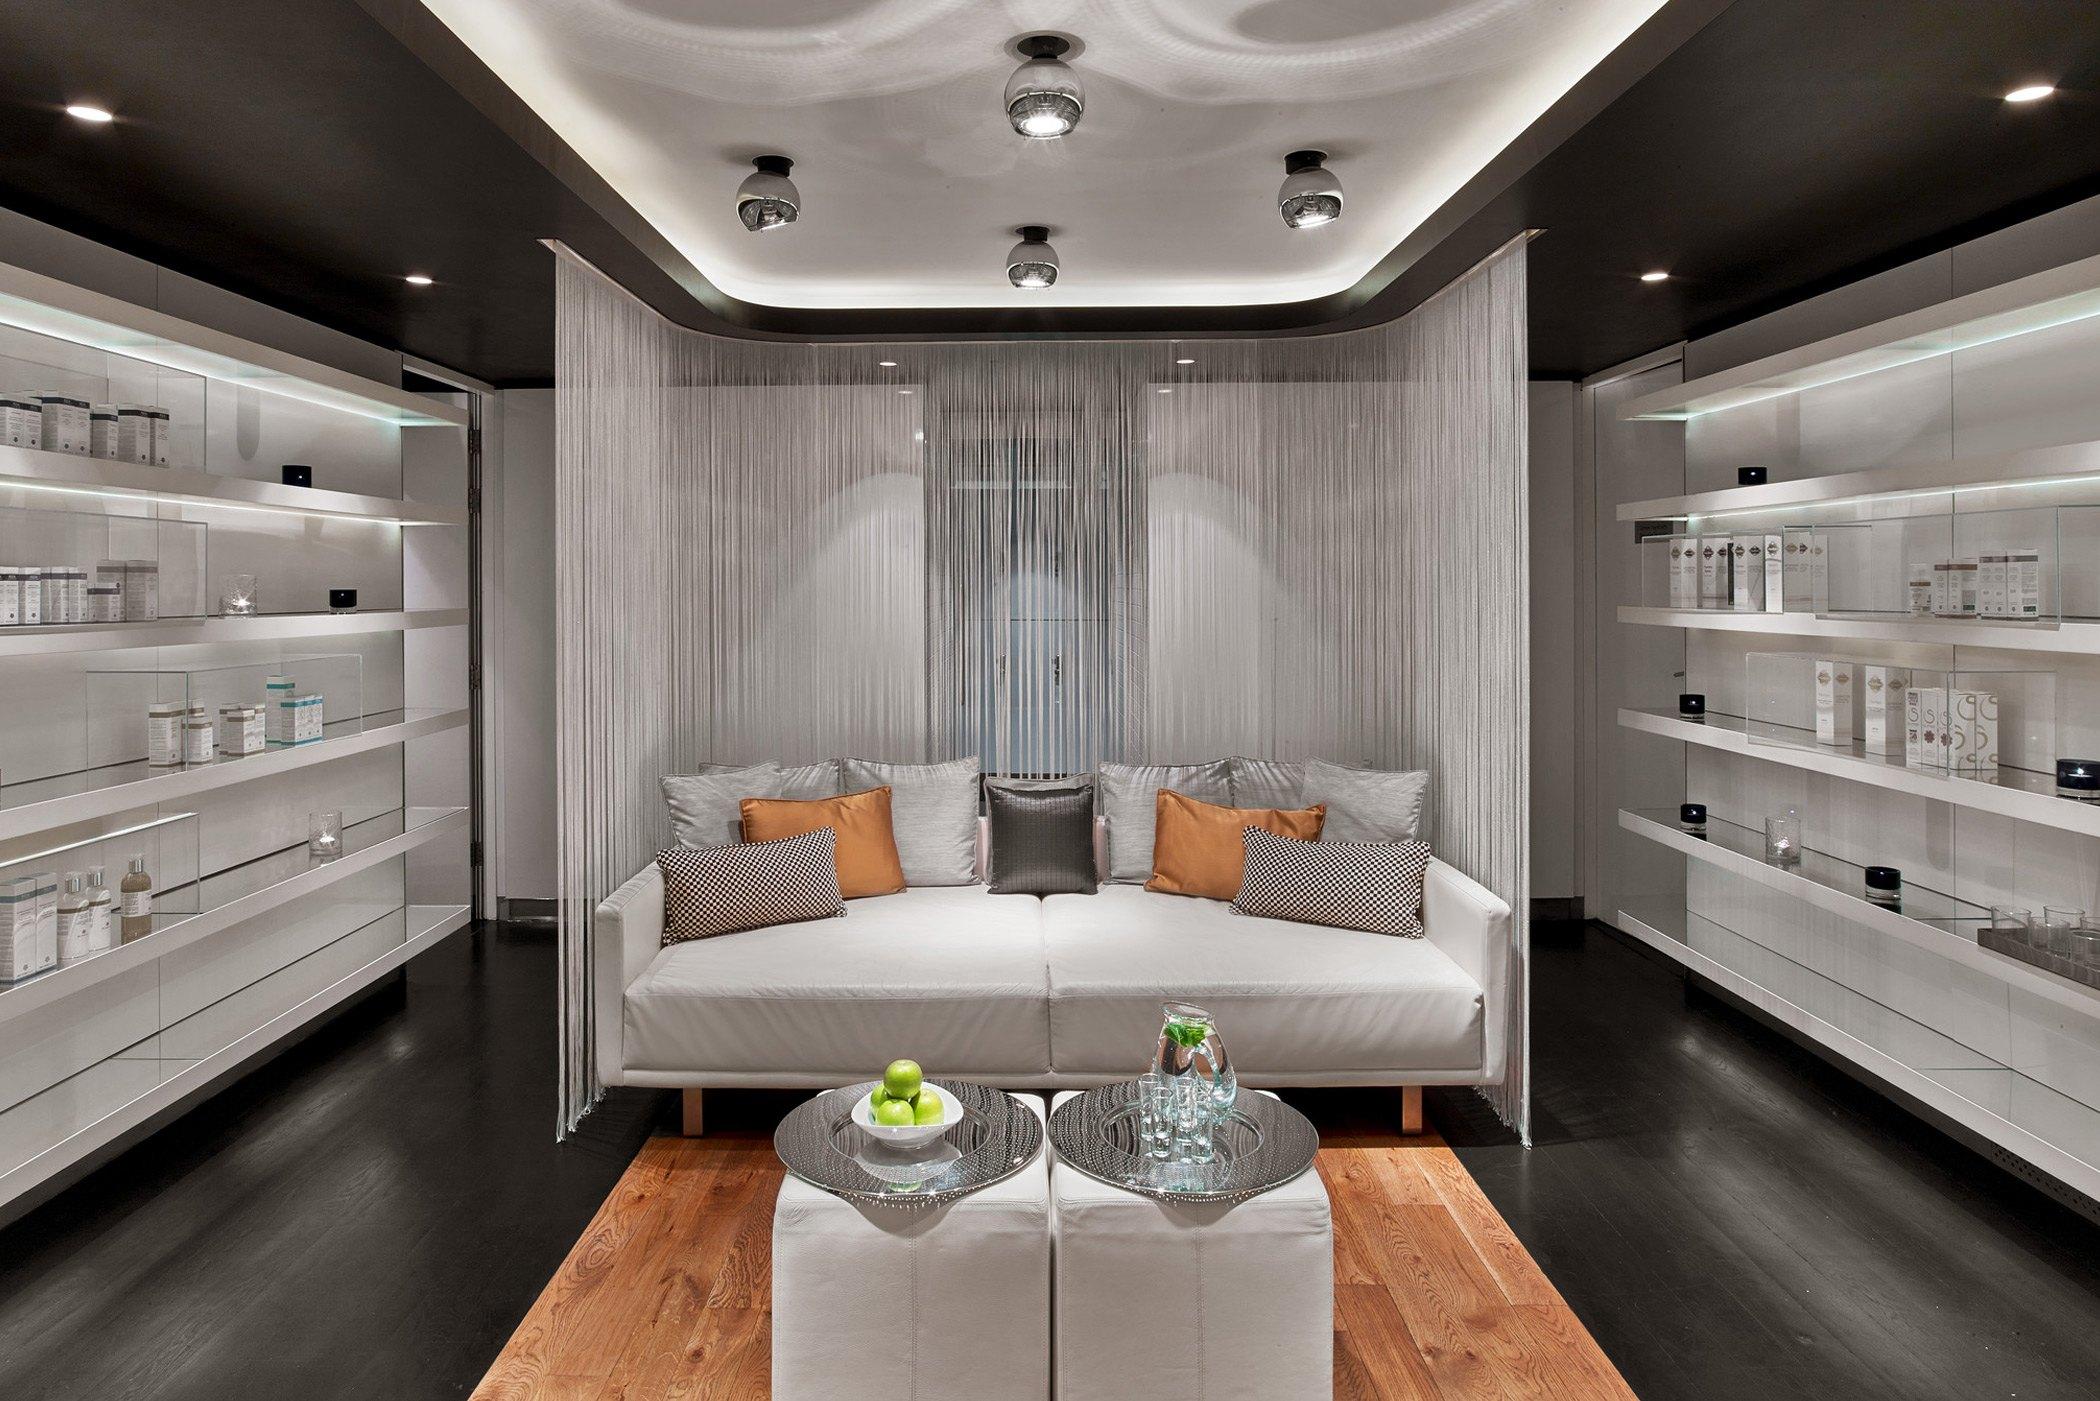 w-london-away-spa-lounge-room.jpg